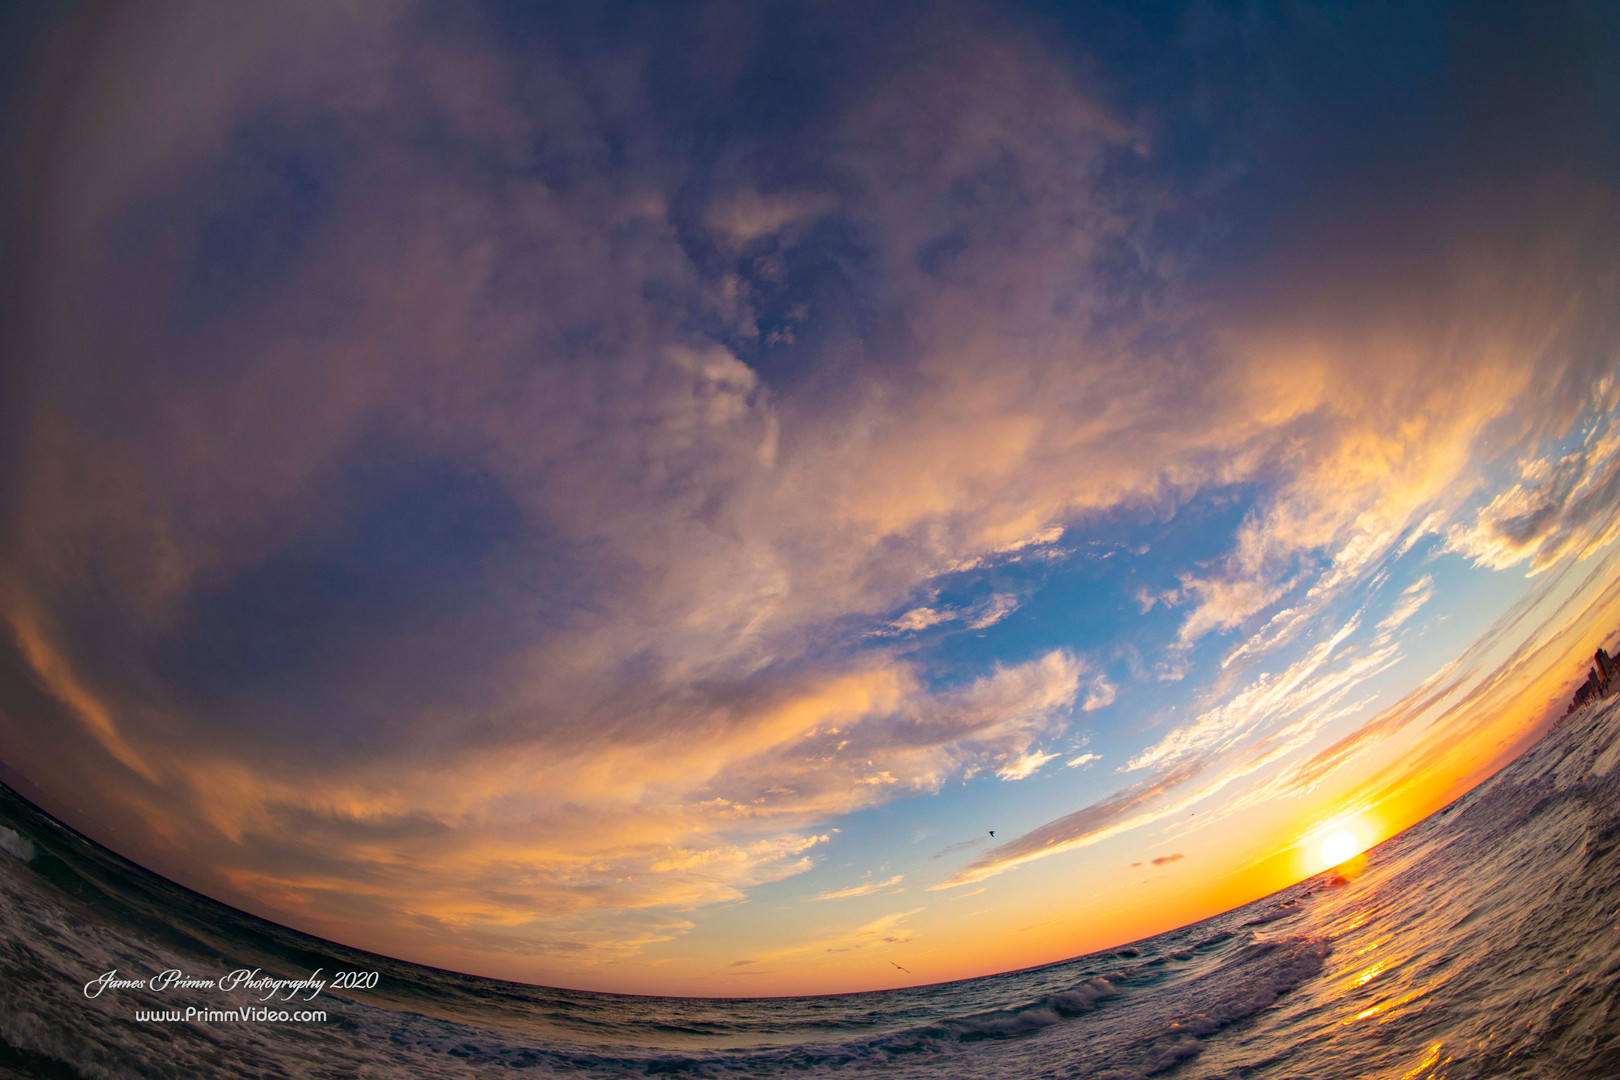 Planet PCB Sunset.jpg